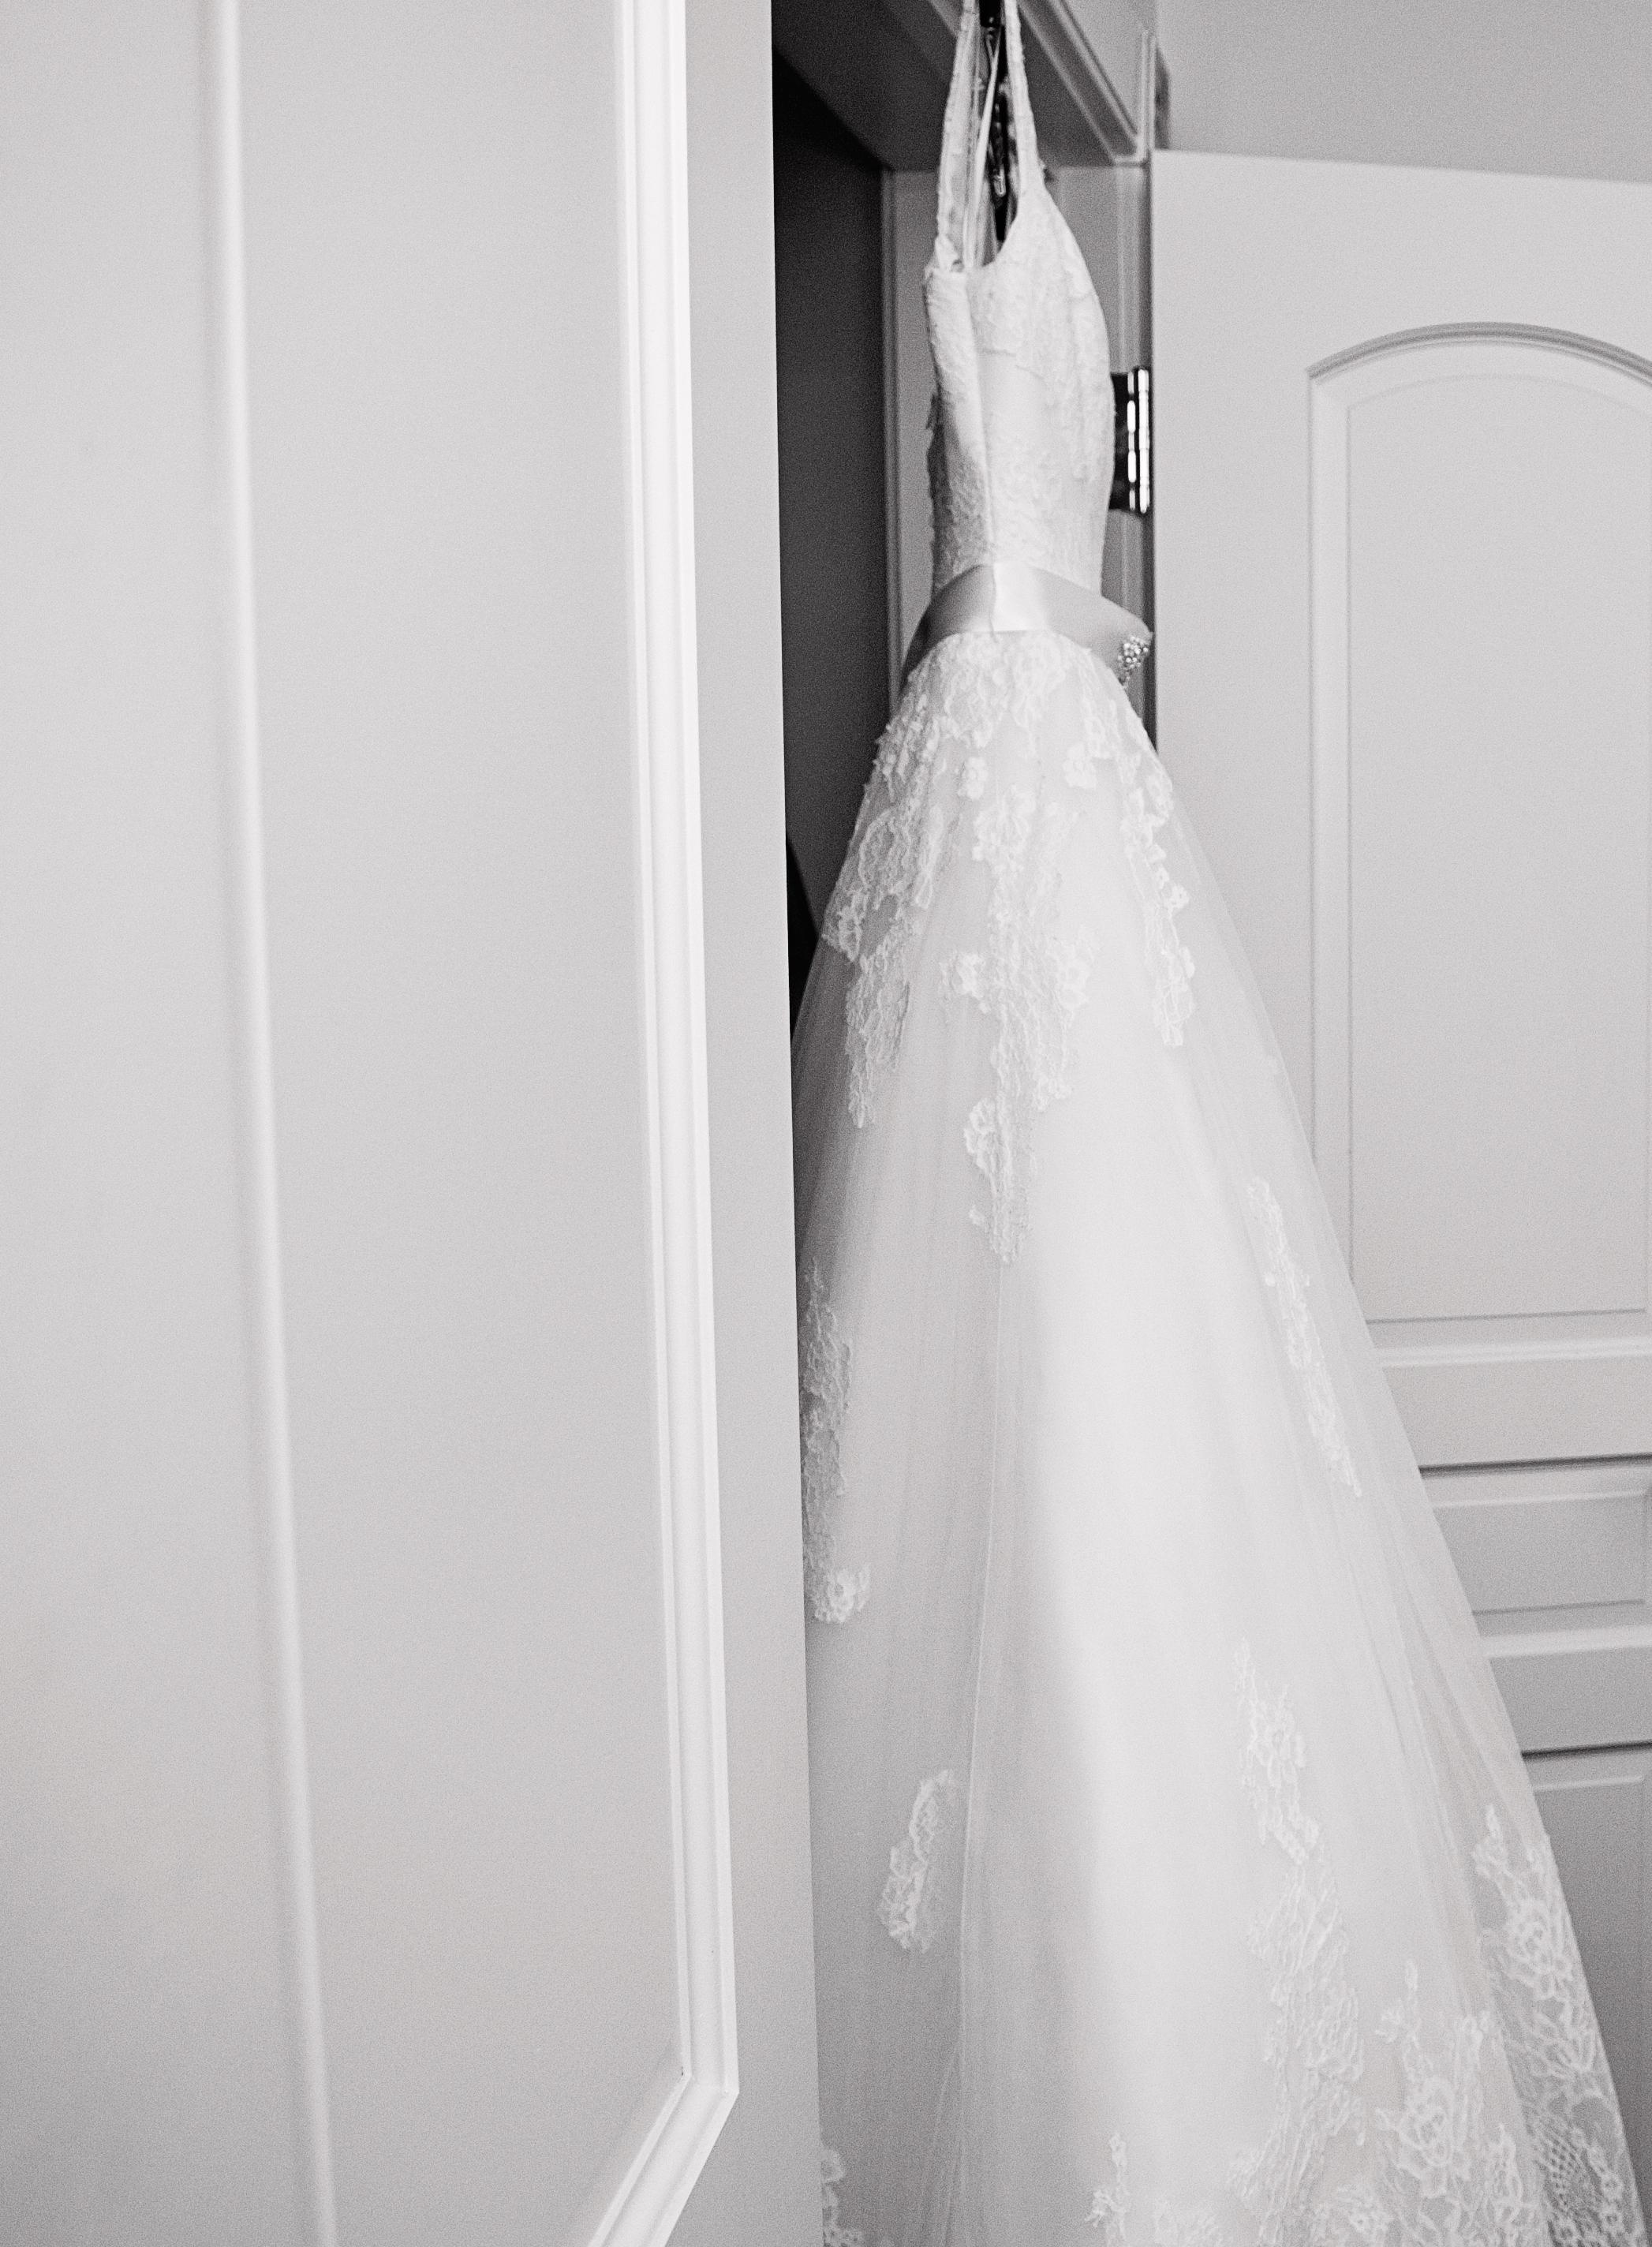 Angela_Chicoski_CT_wedding_photographer_077.jpg